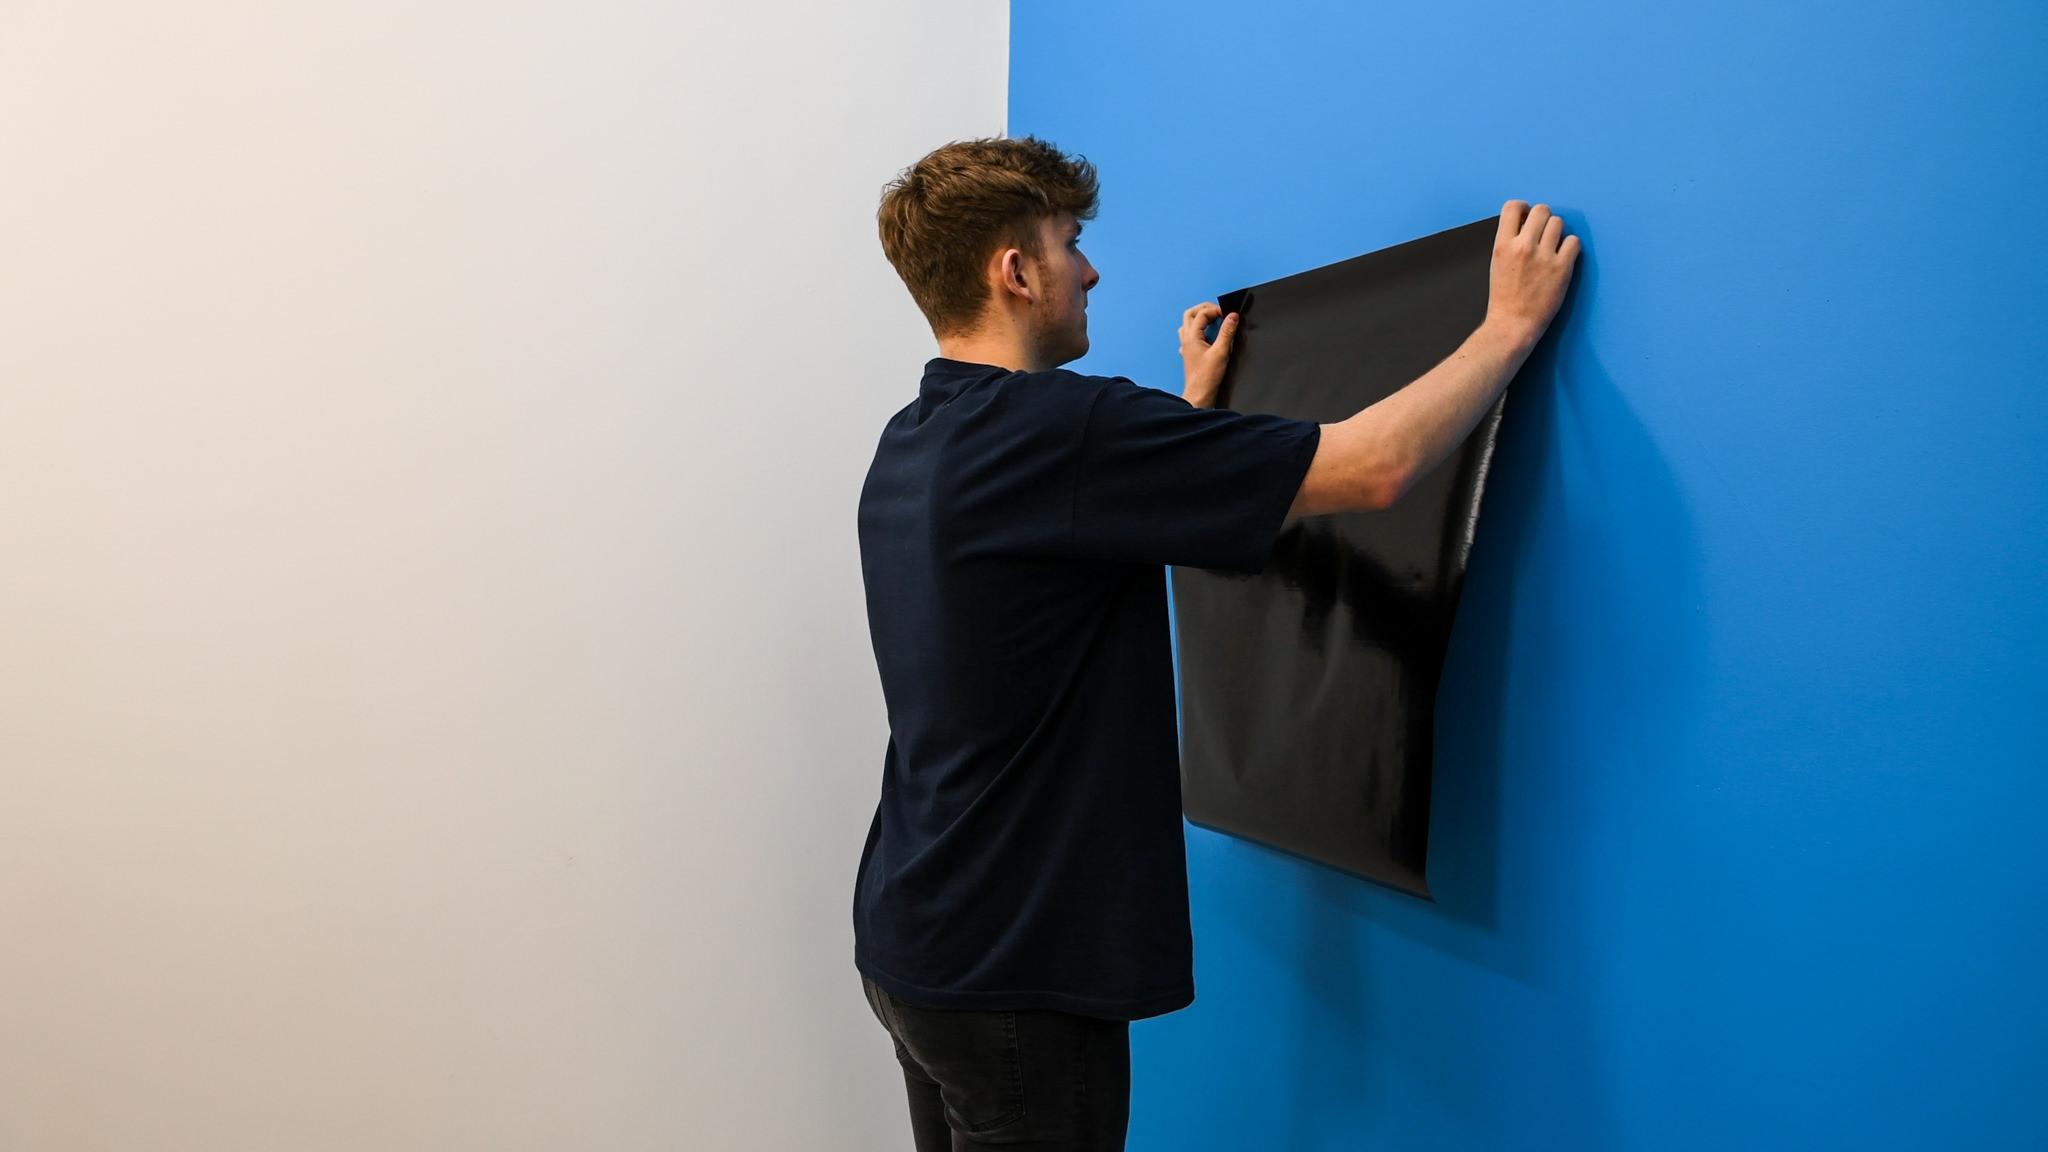 Magic Blackboard and chalkboard